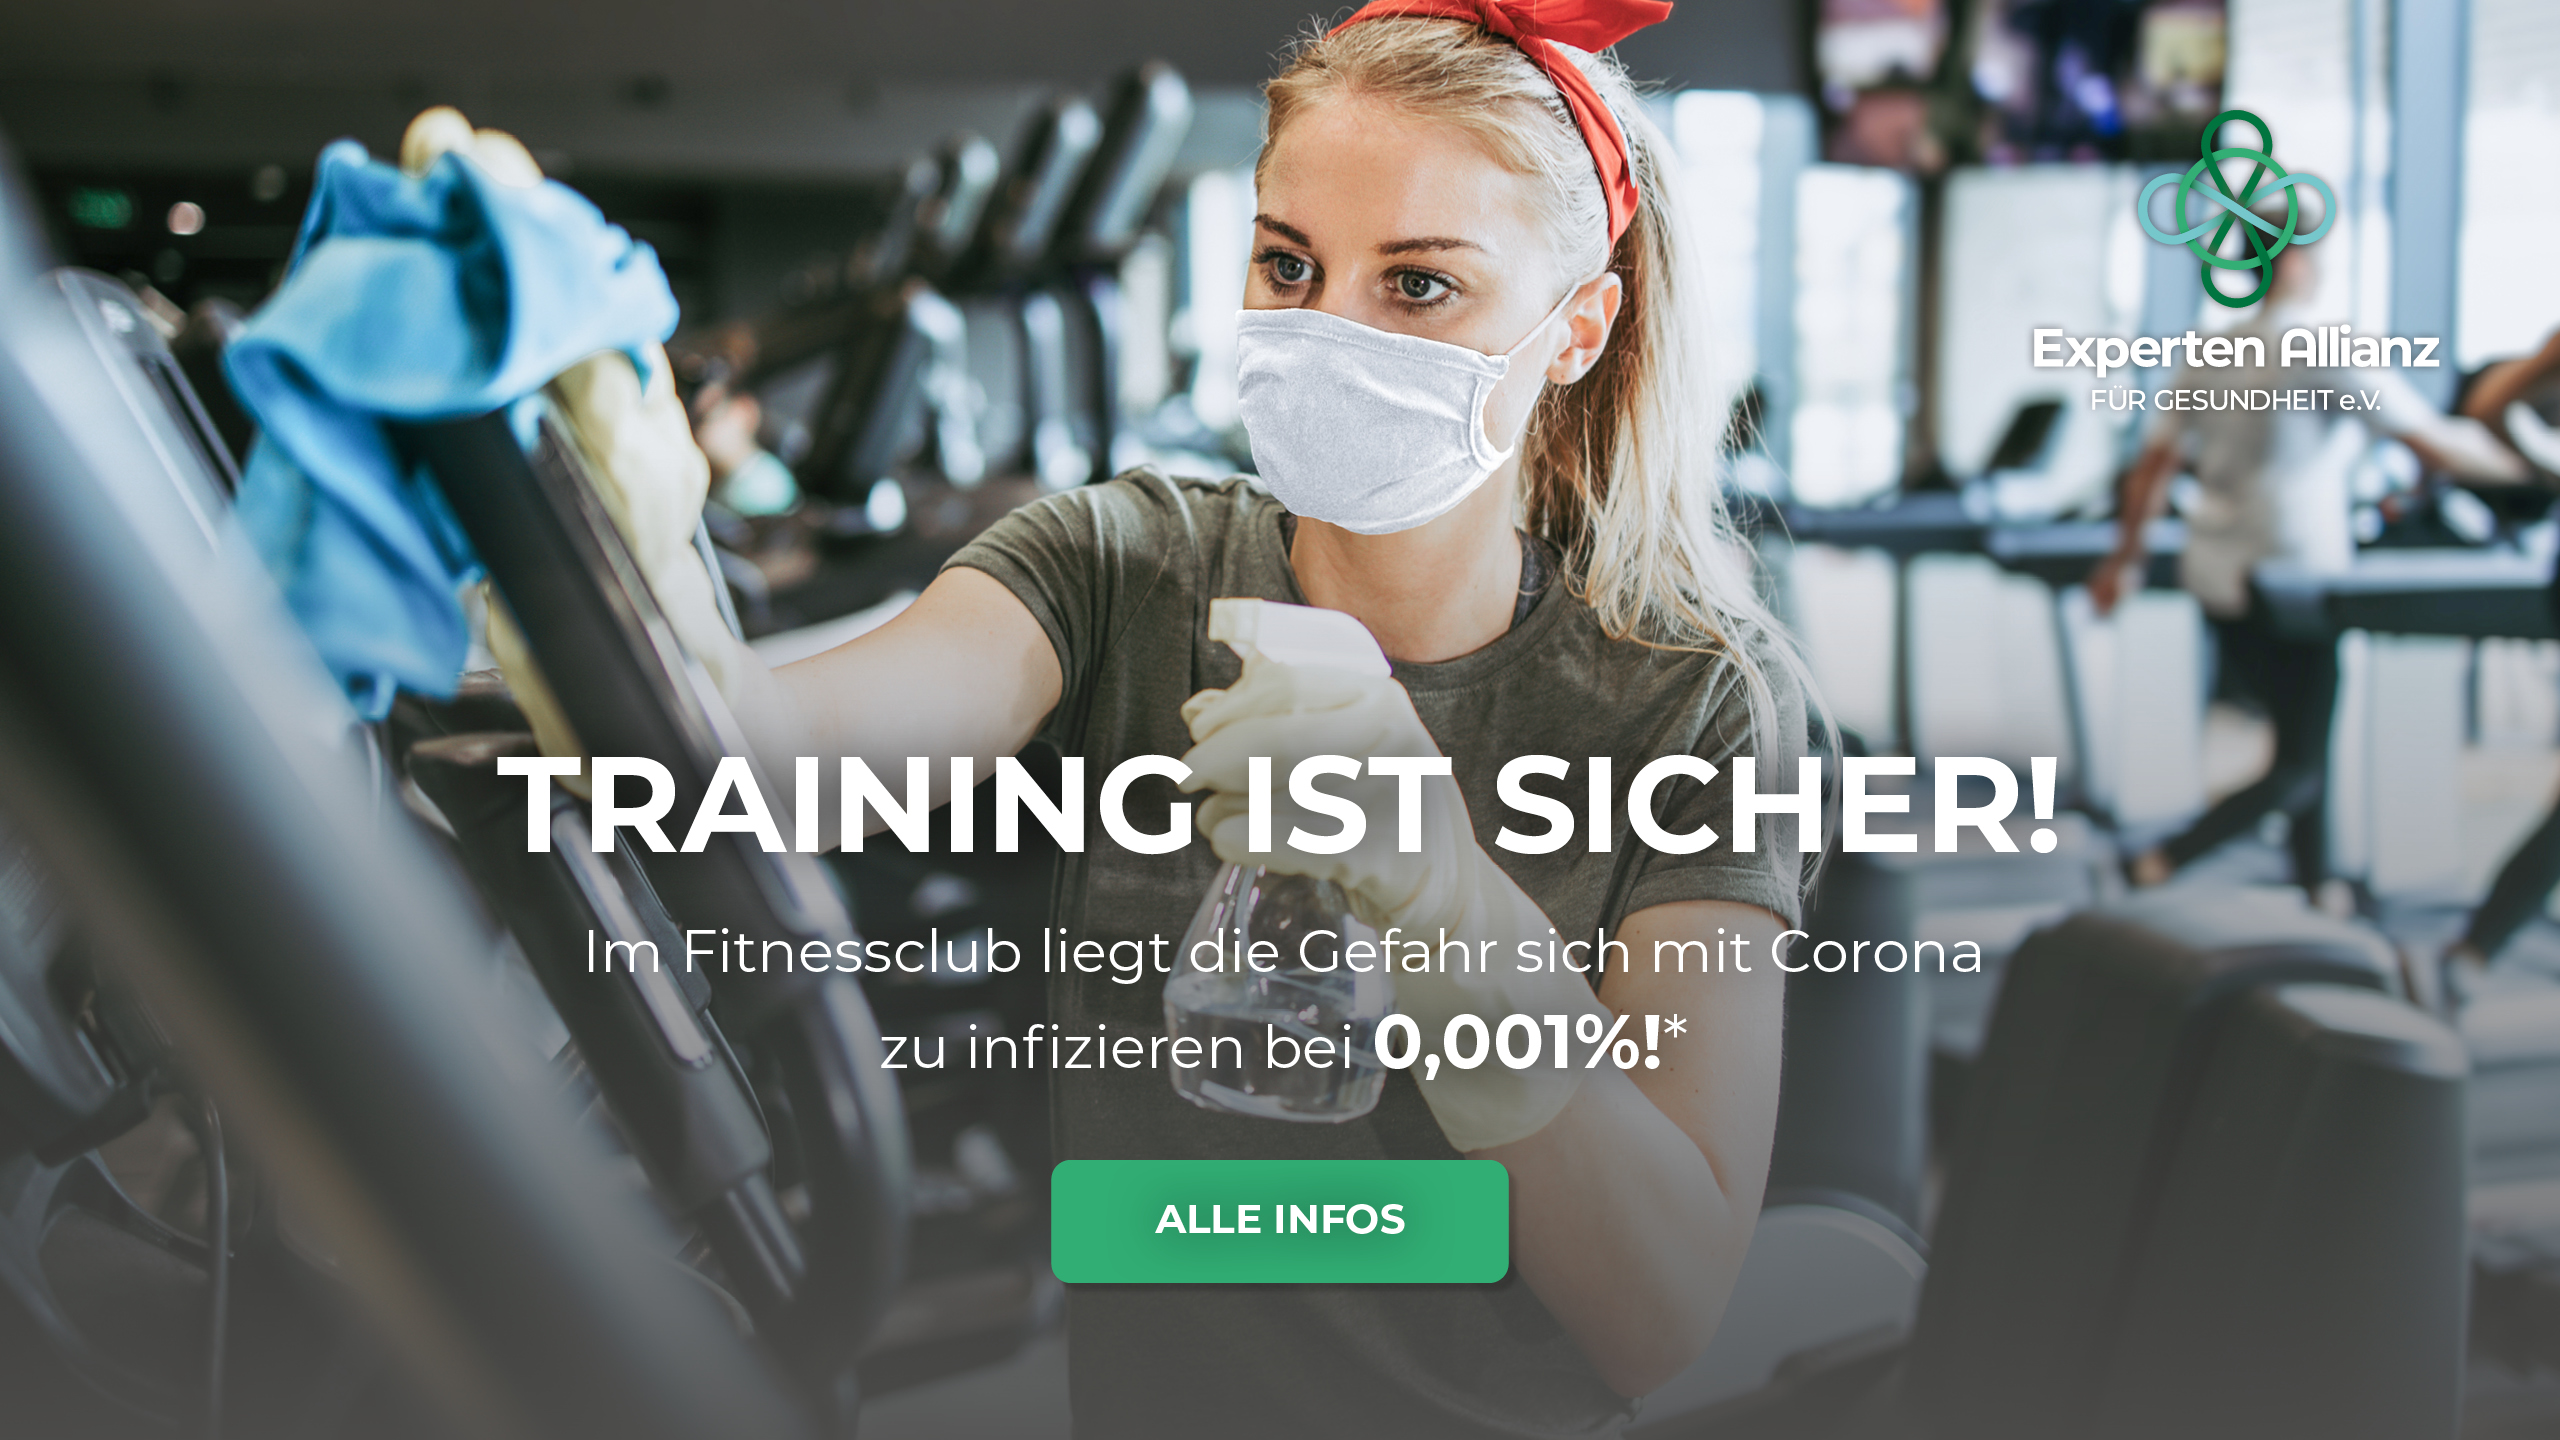 EAfG_slider-training1